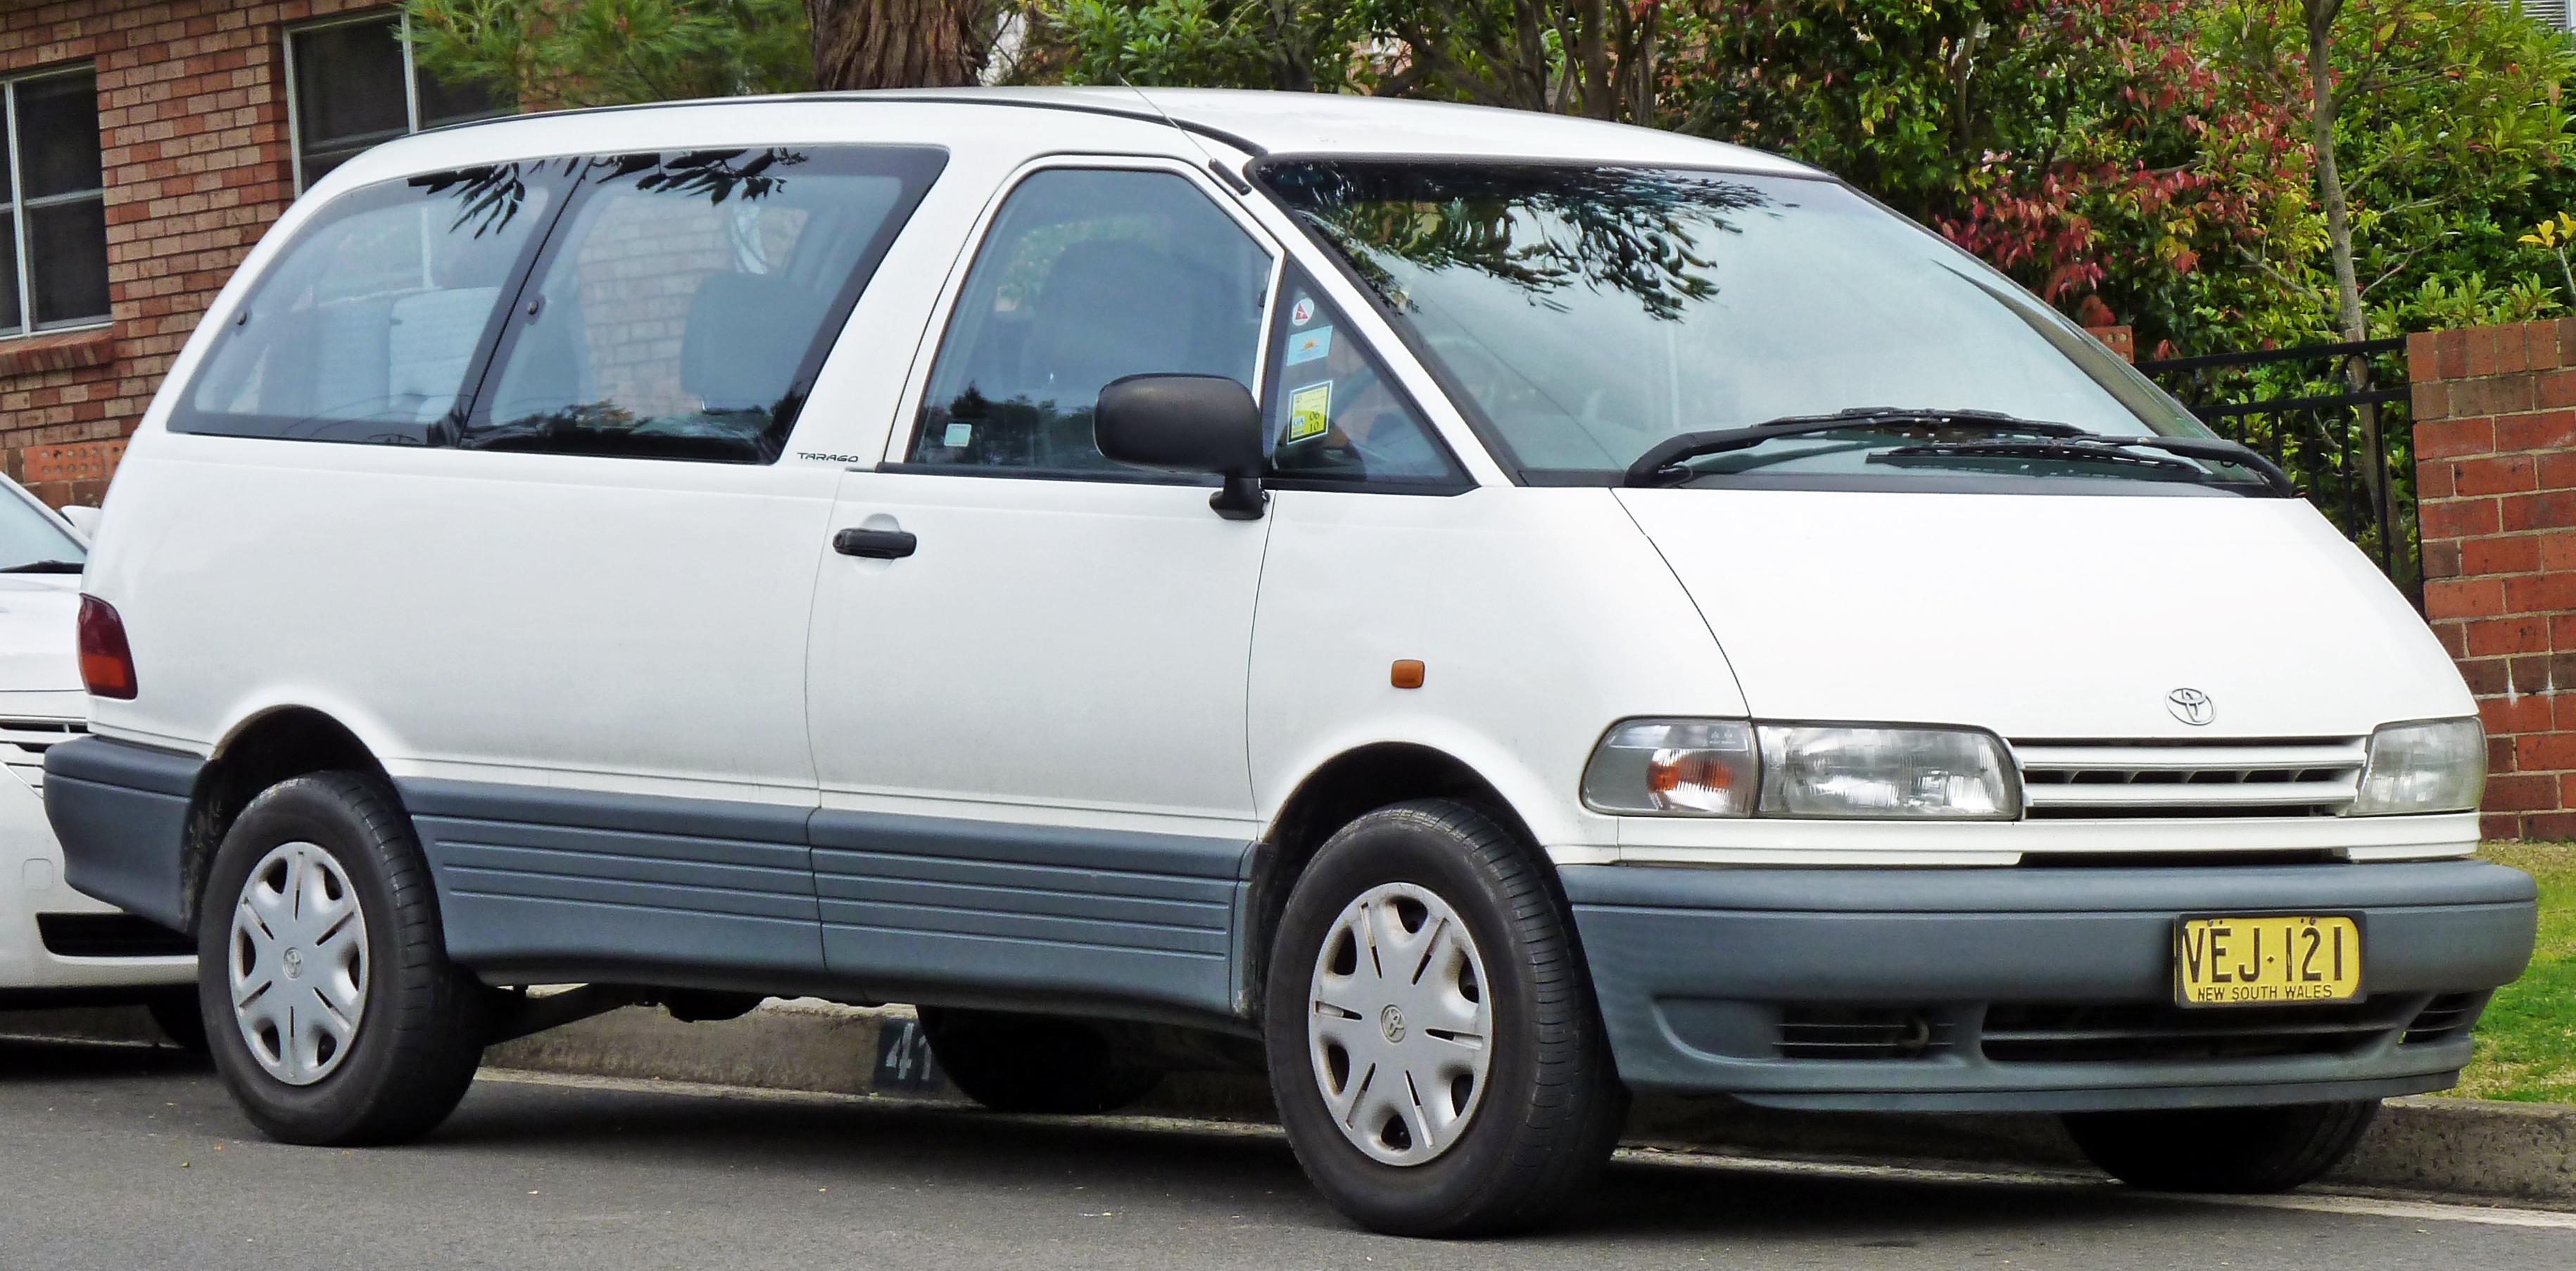 1996-2000_Toyota_Tarago_(TCR10R)_GLi_van